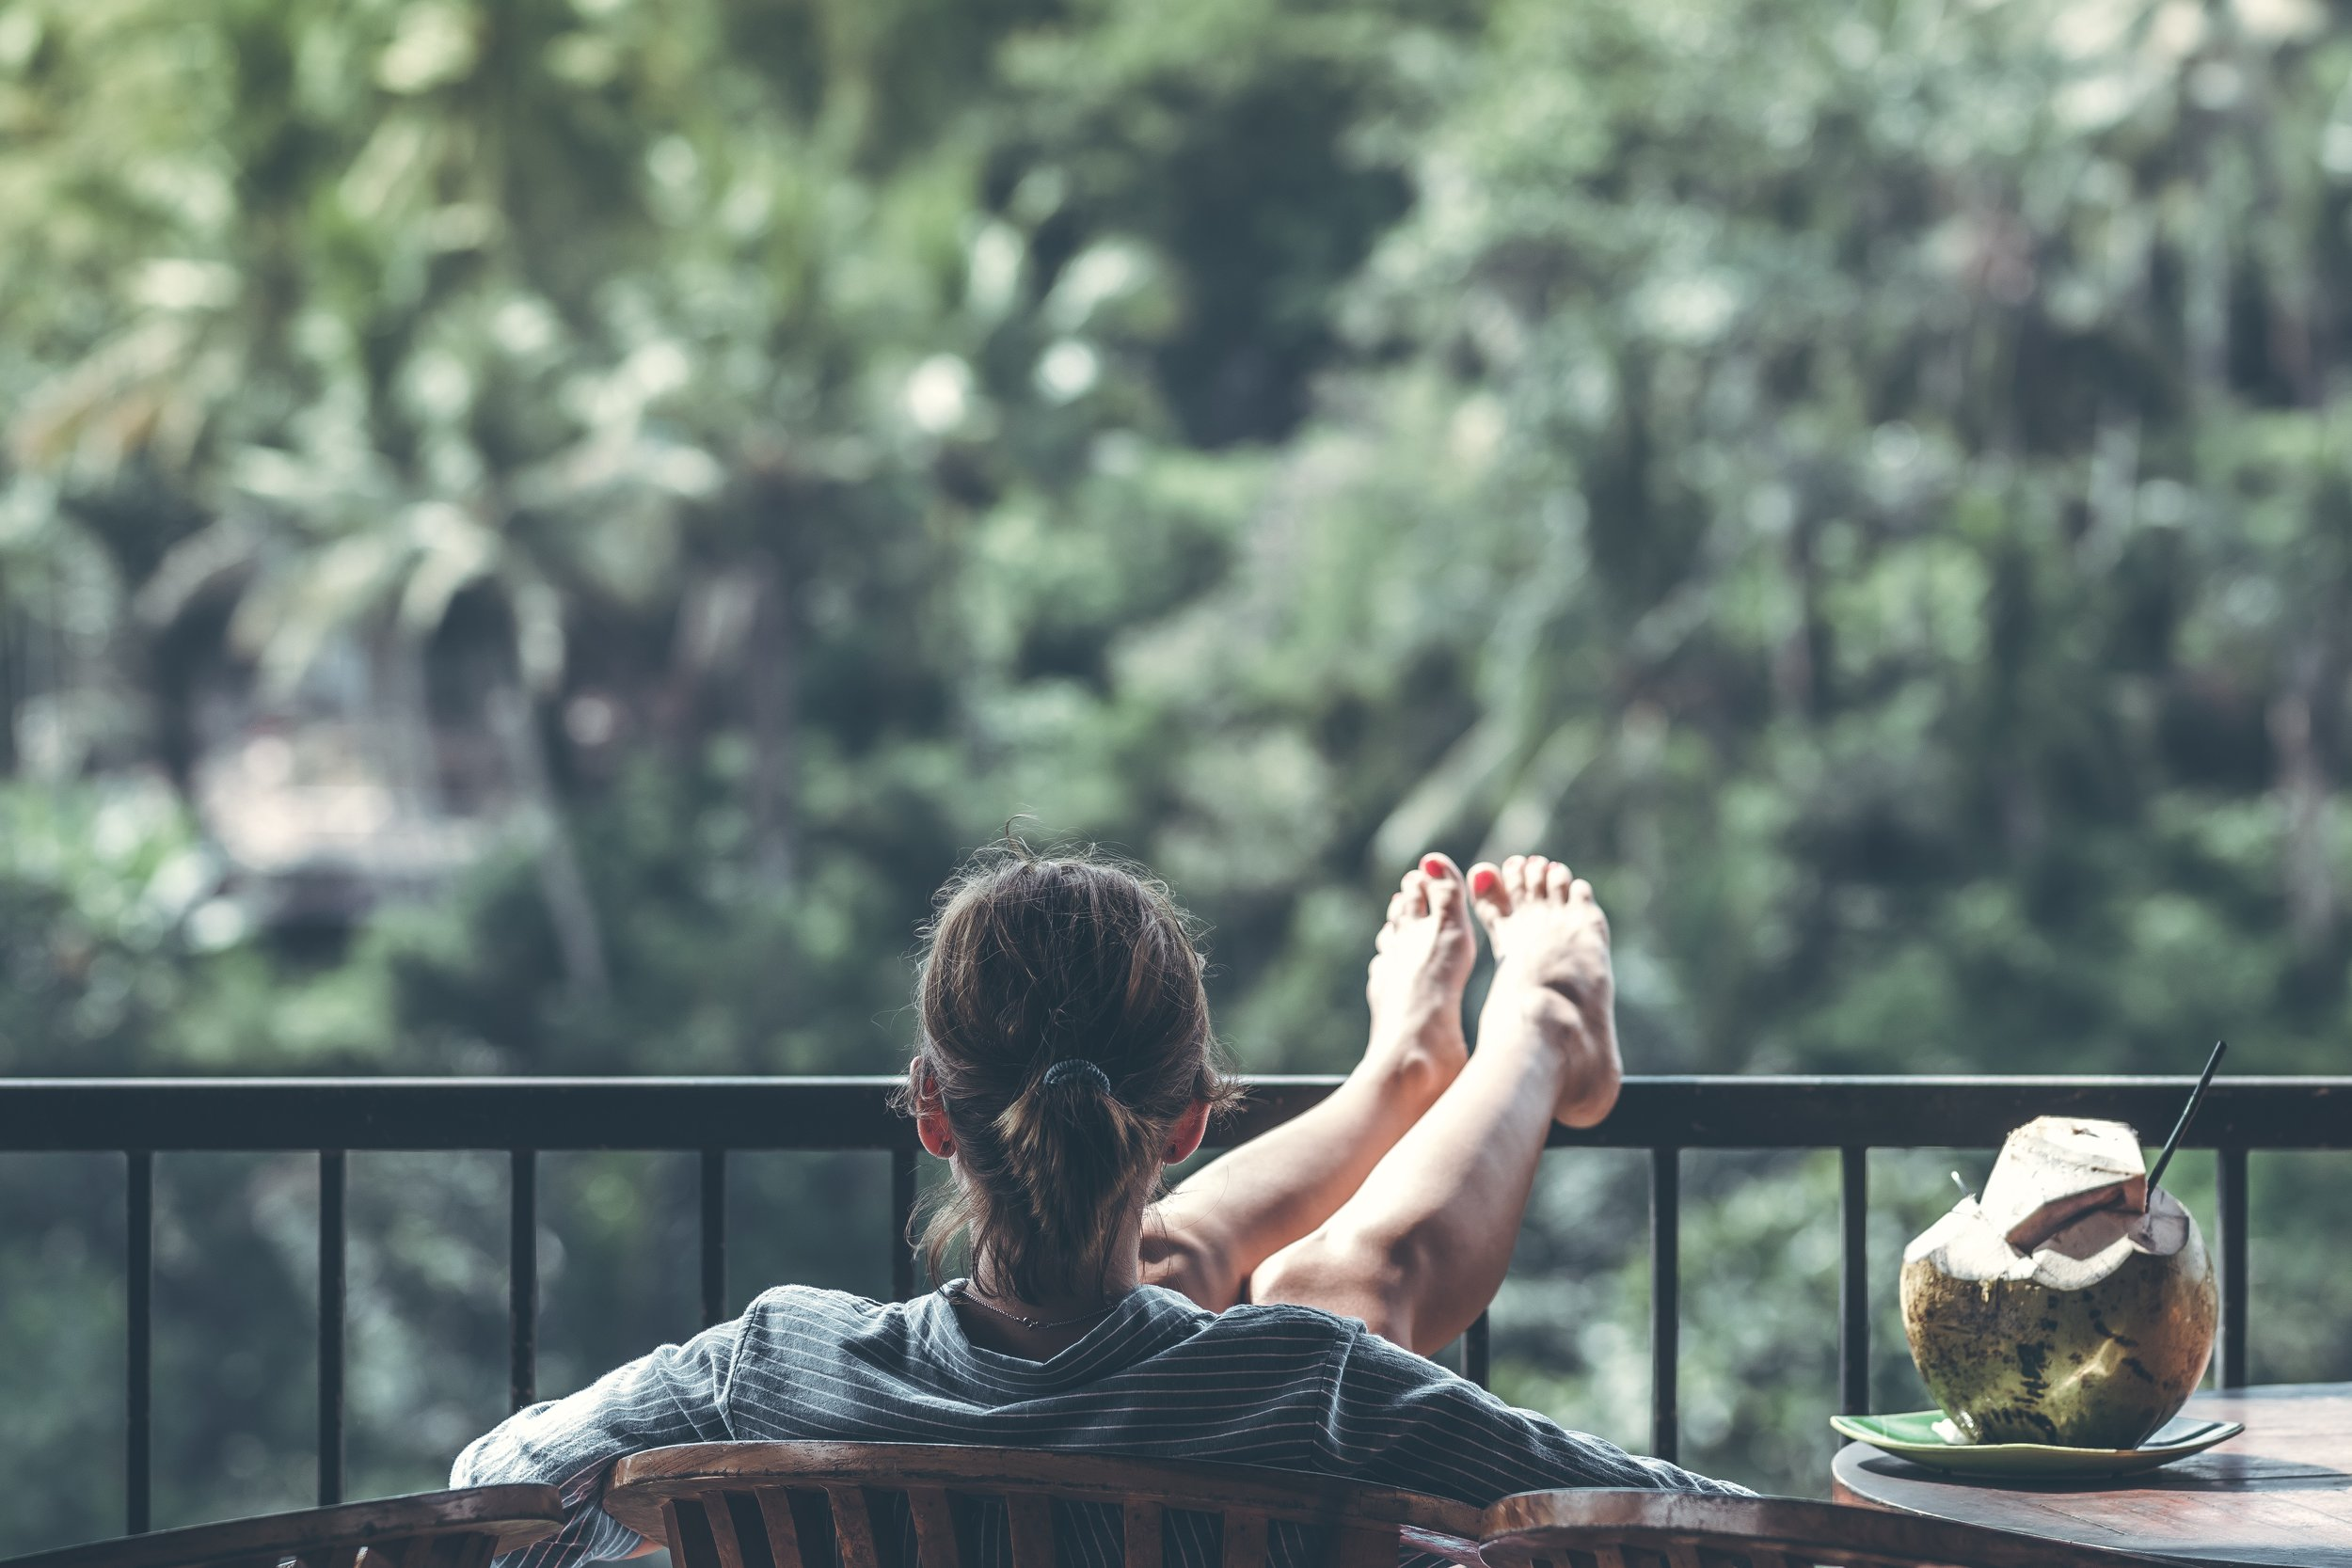 adult-balcony-beverage-1230665.jpg